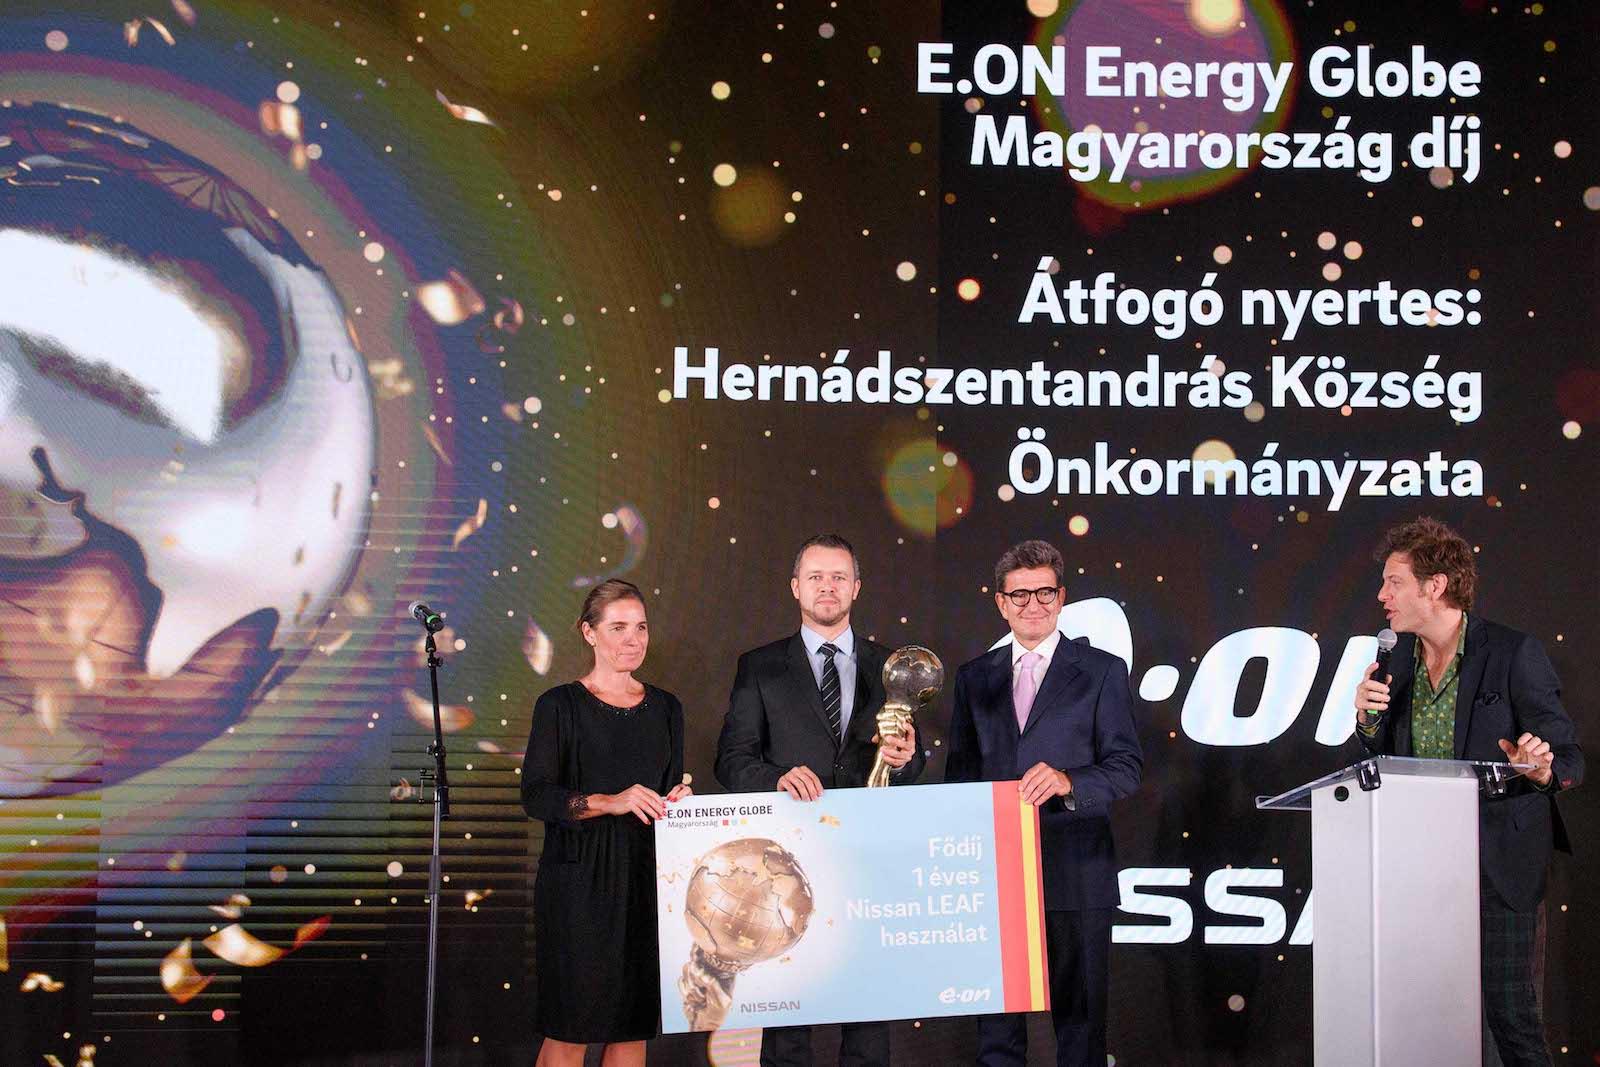 EON_ENERGY_GLOBE_2019_003